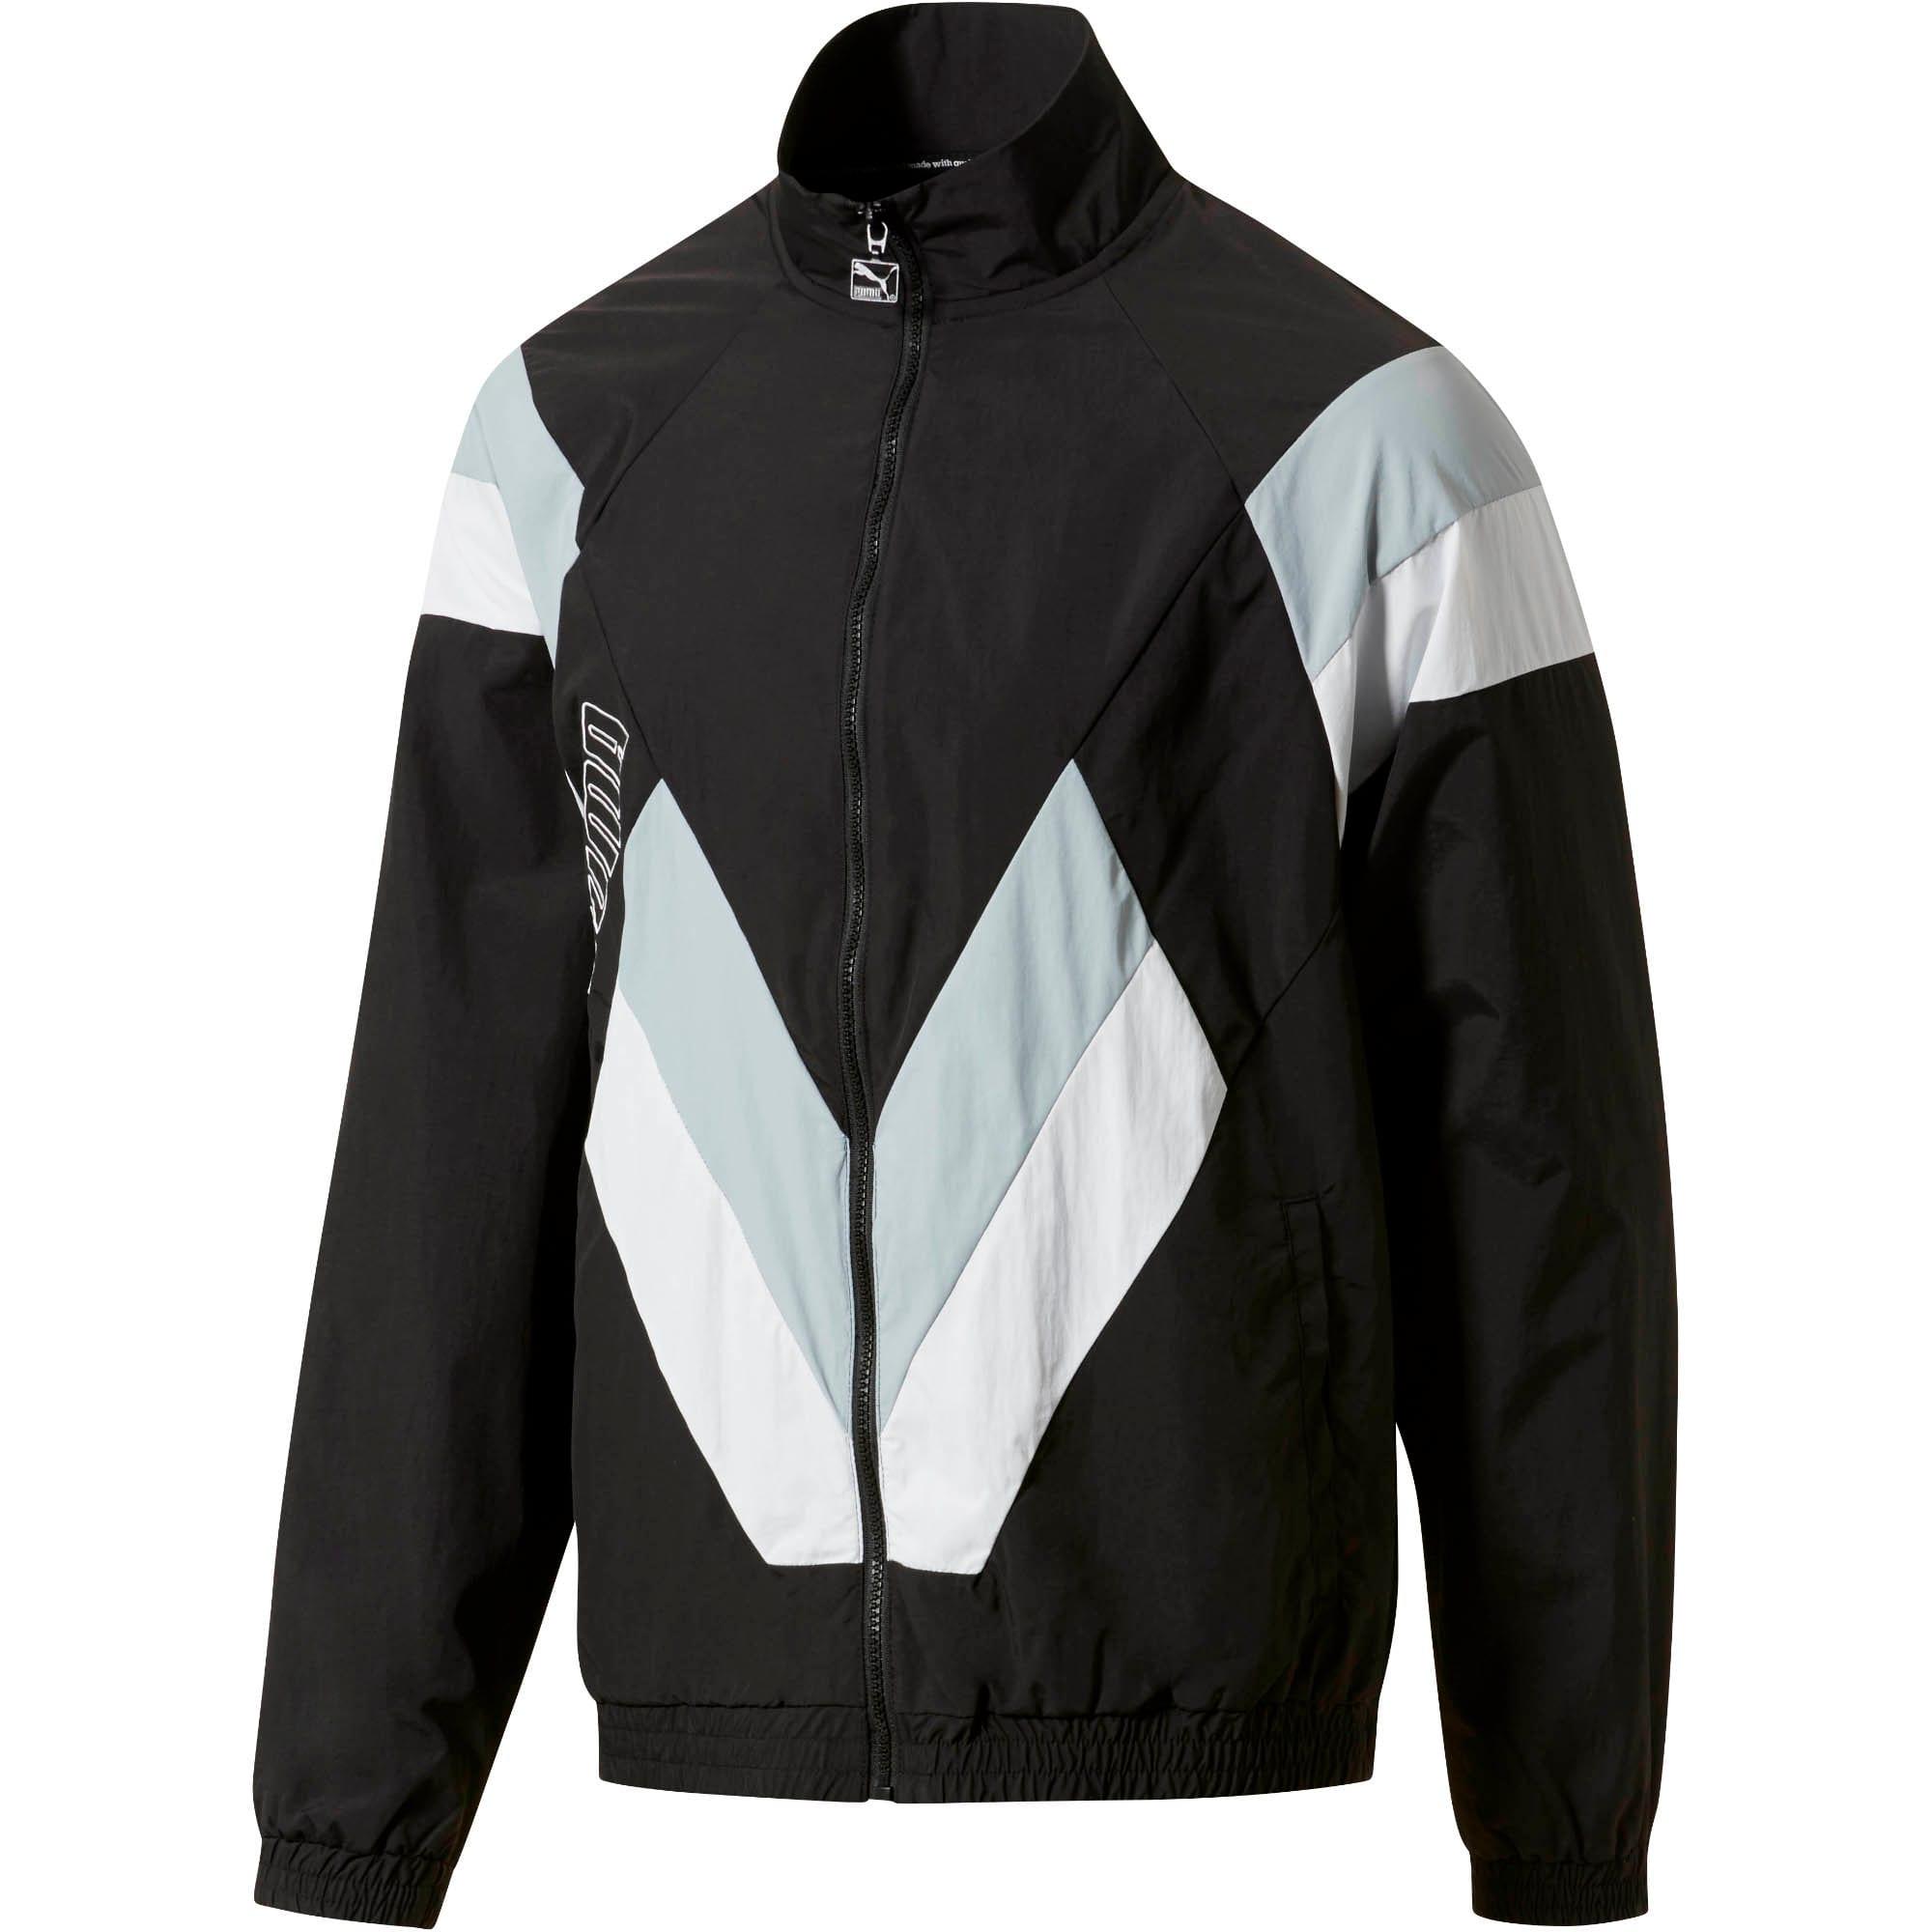 Thumbnail 1 of Heritage Men's Jacket, Puma Black, medium